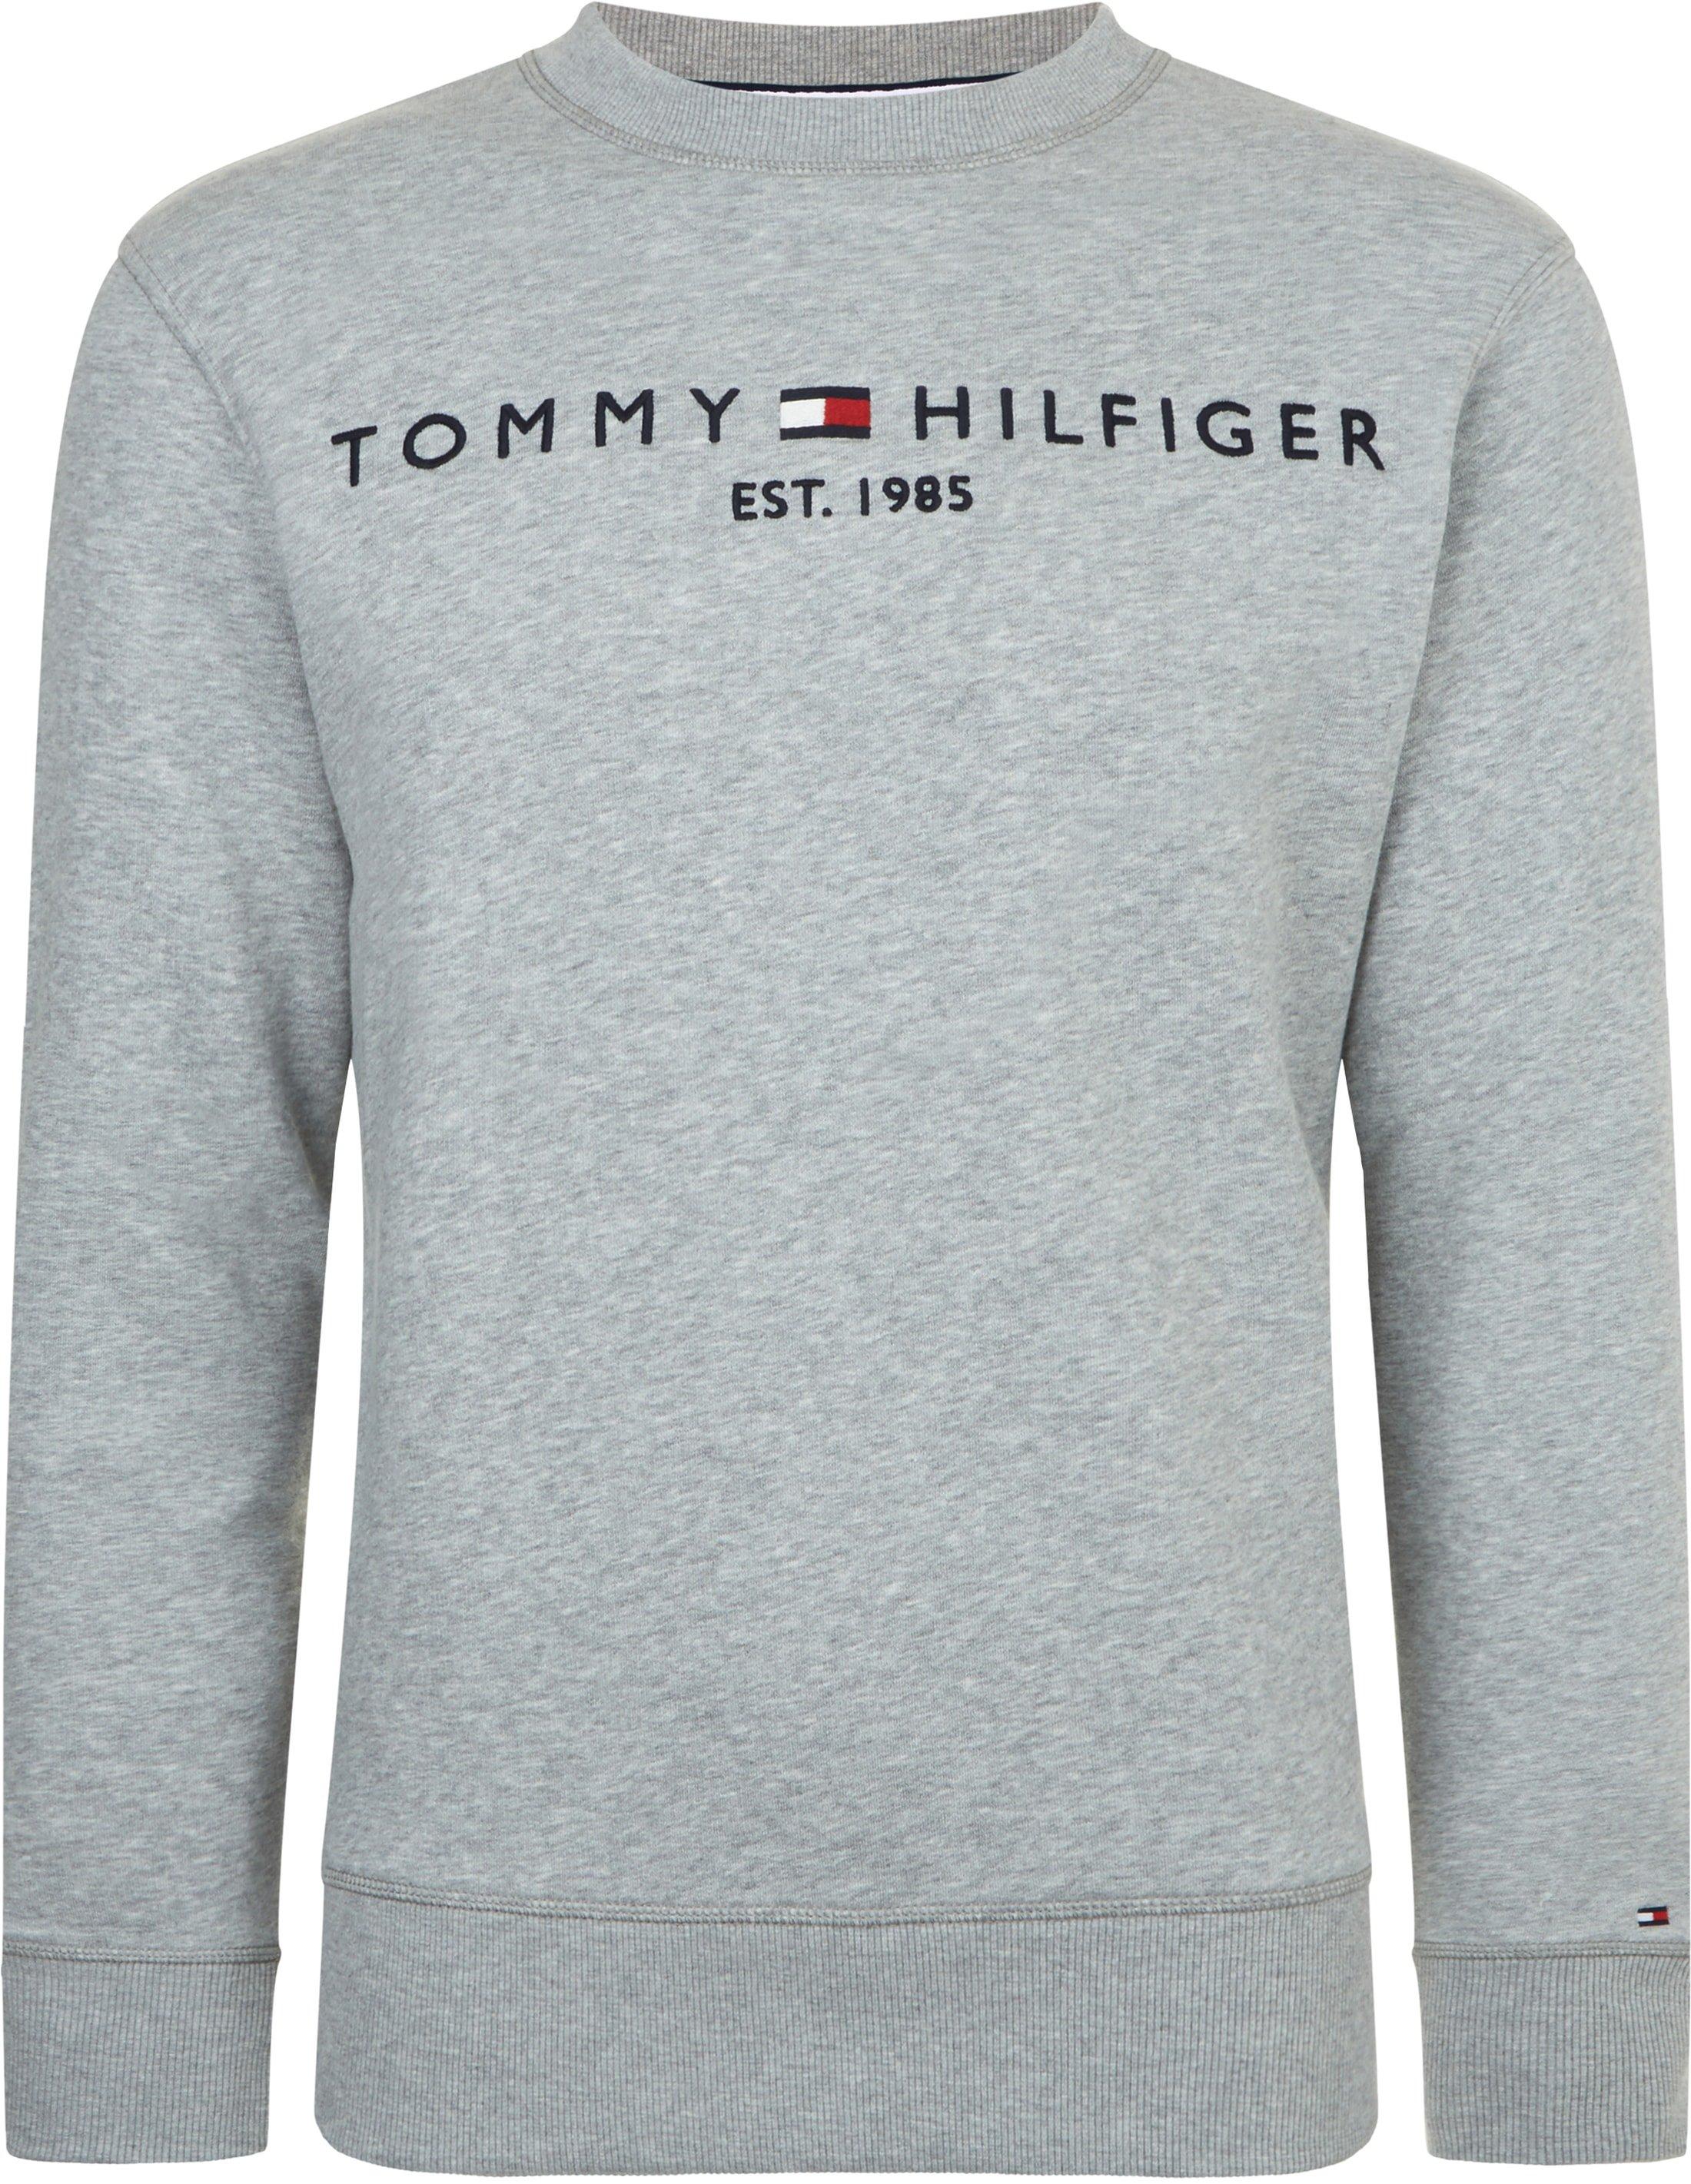 Tommy Hilfiger Sweater Grey foto 0